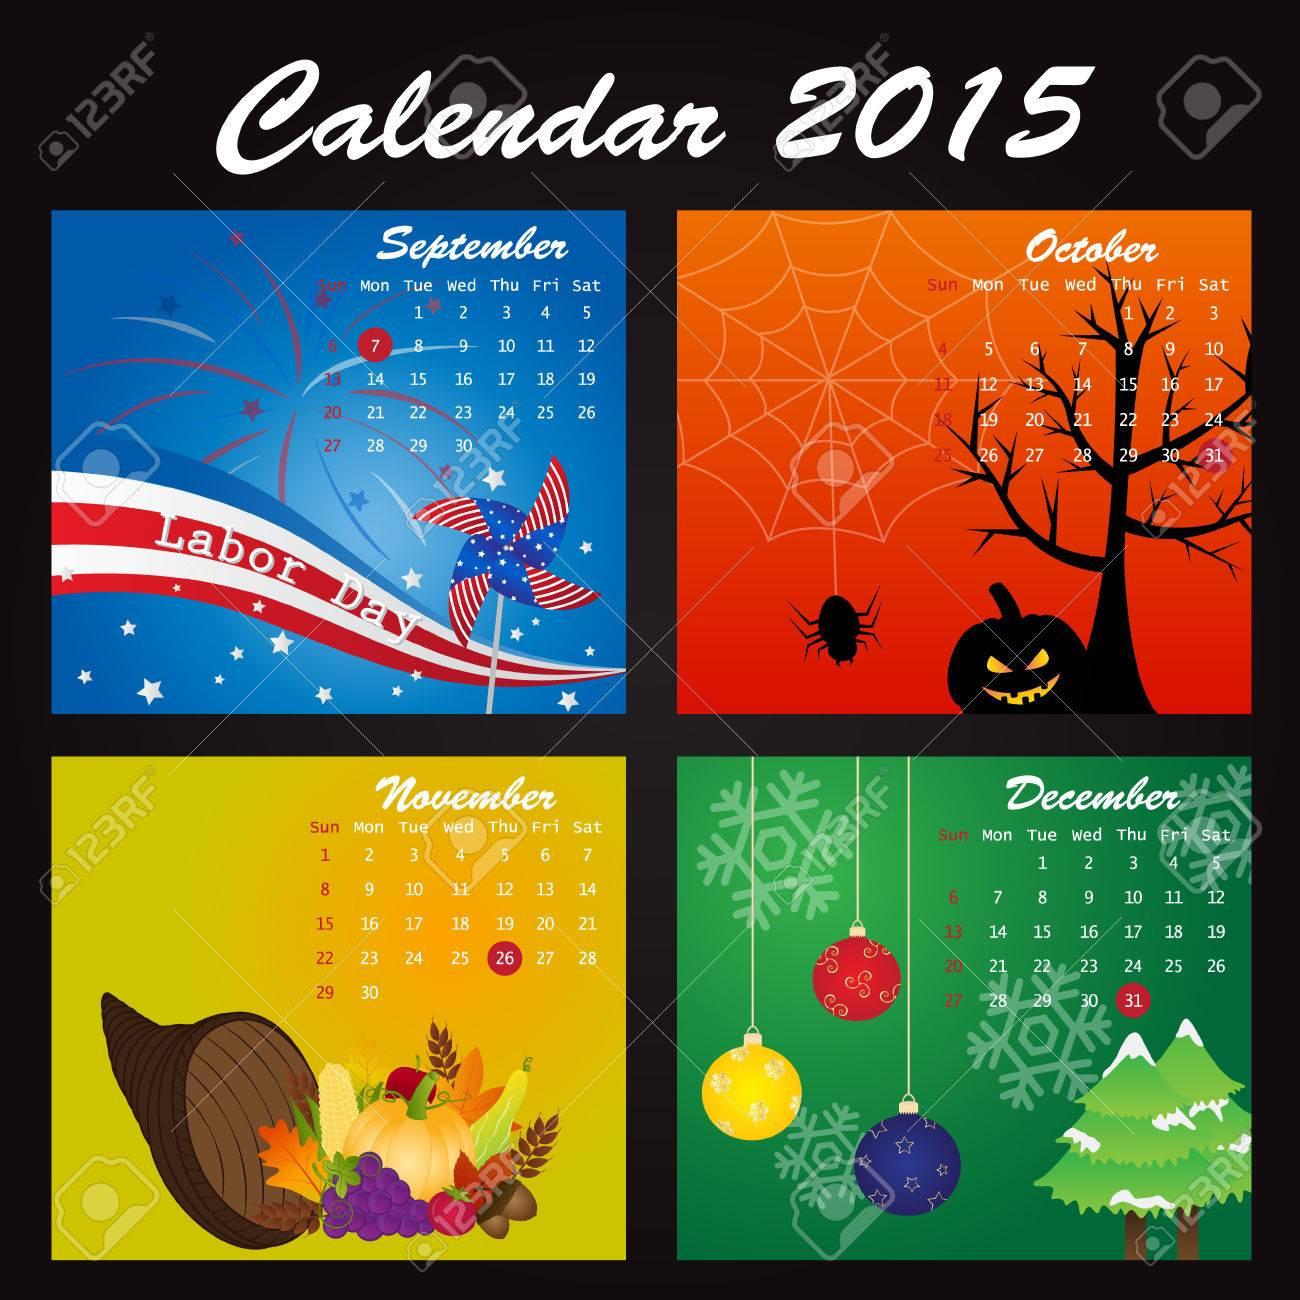 Holiday Calendar of 2015: September, October, November, December